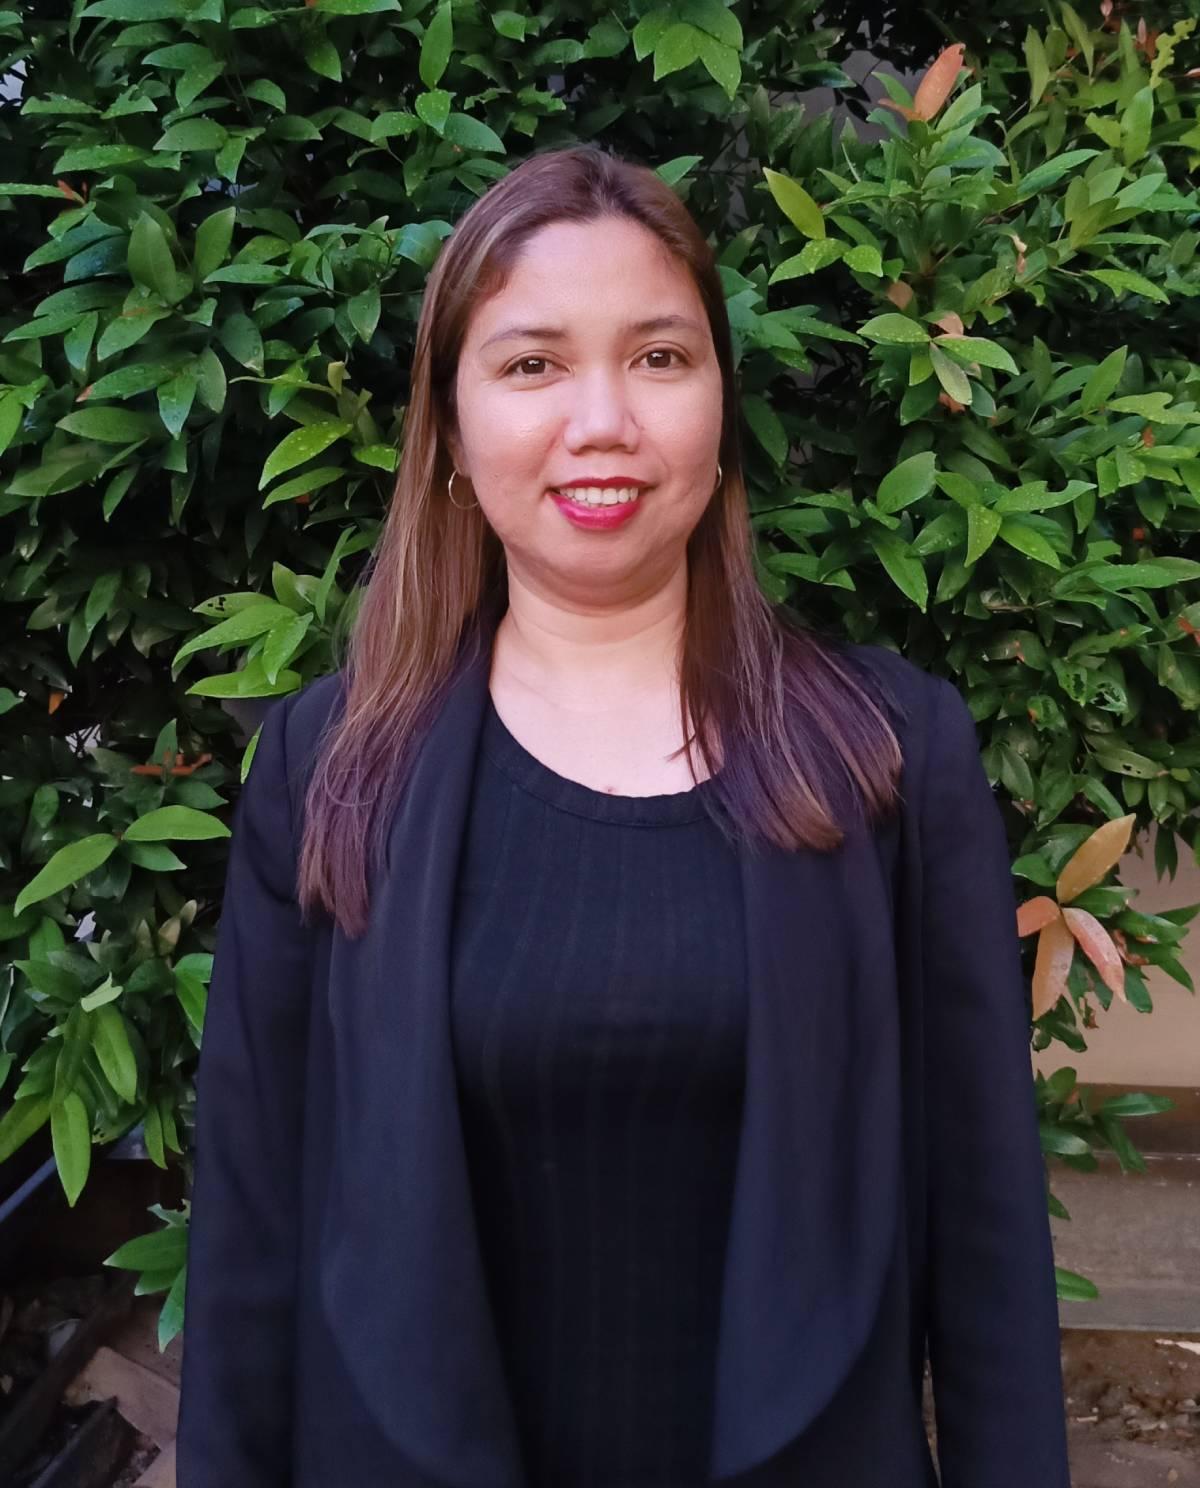 Rosemarie Binas